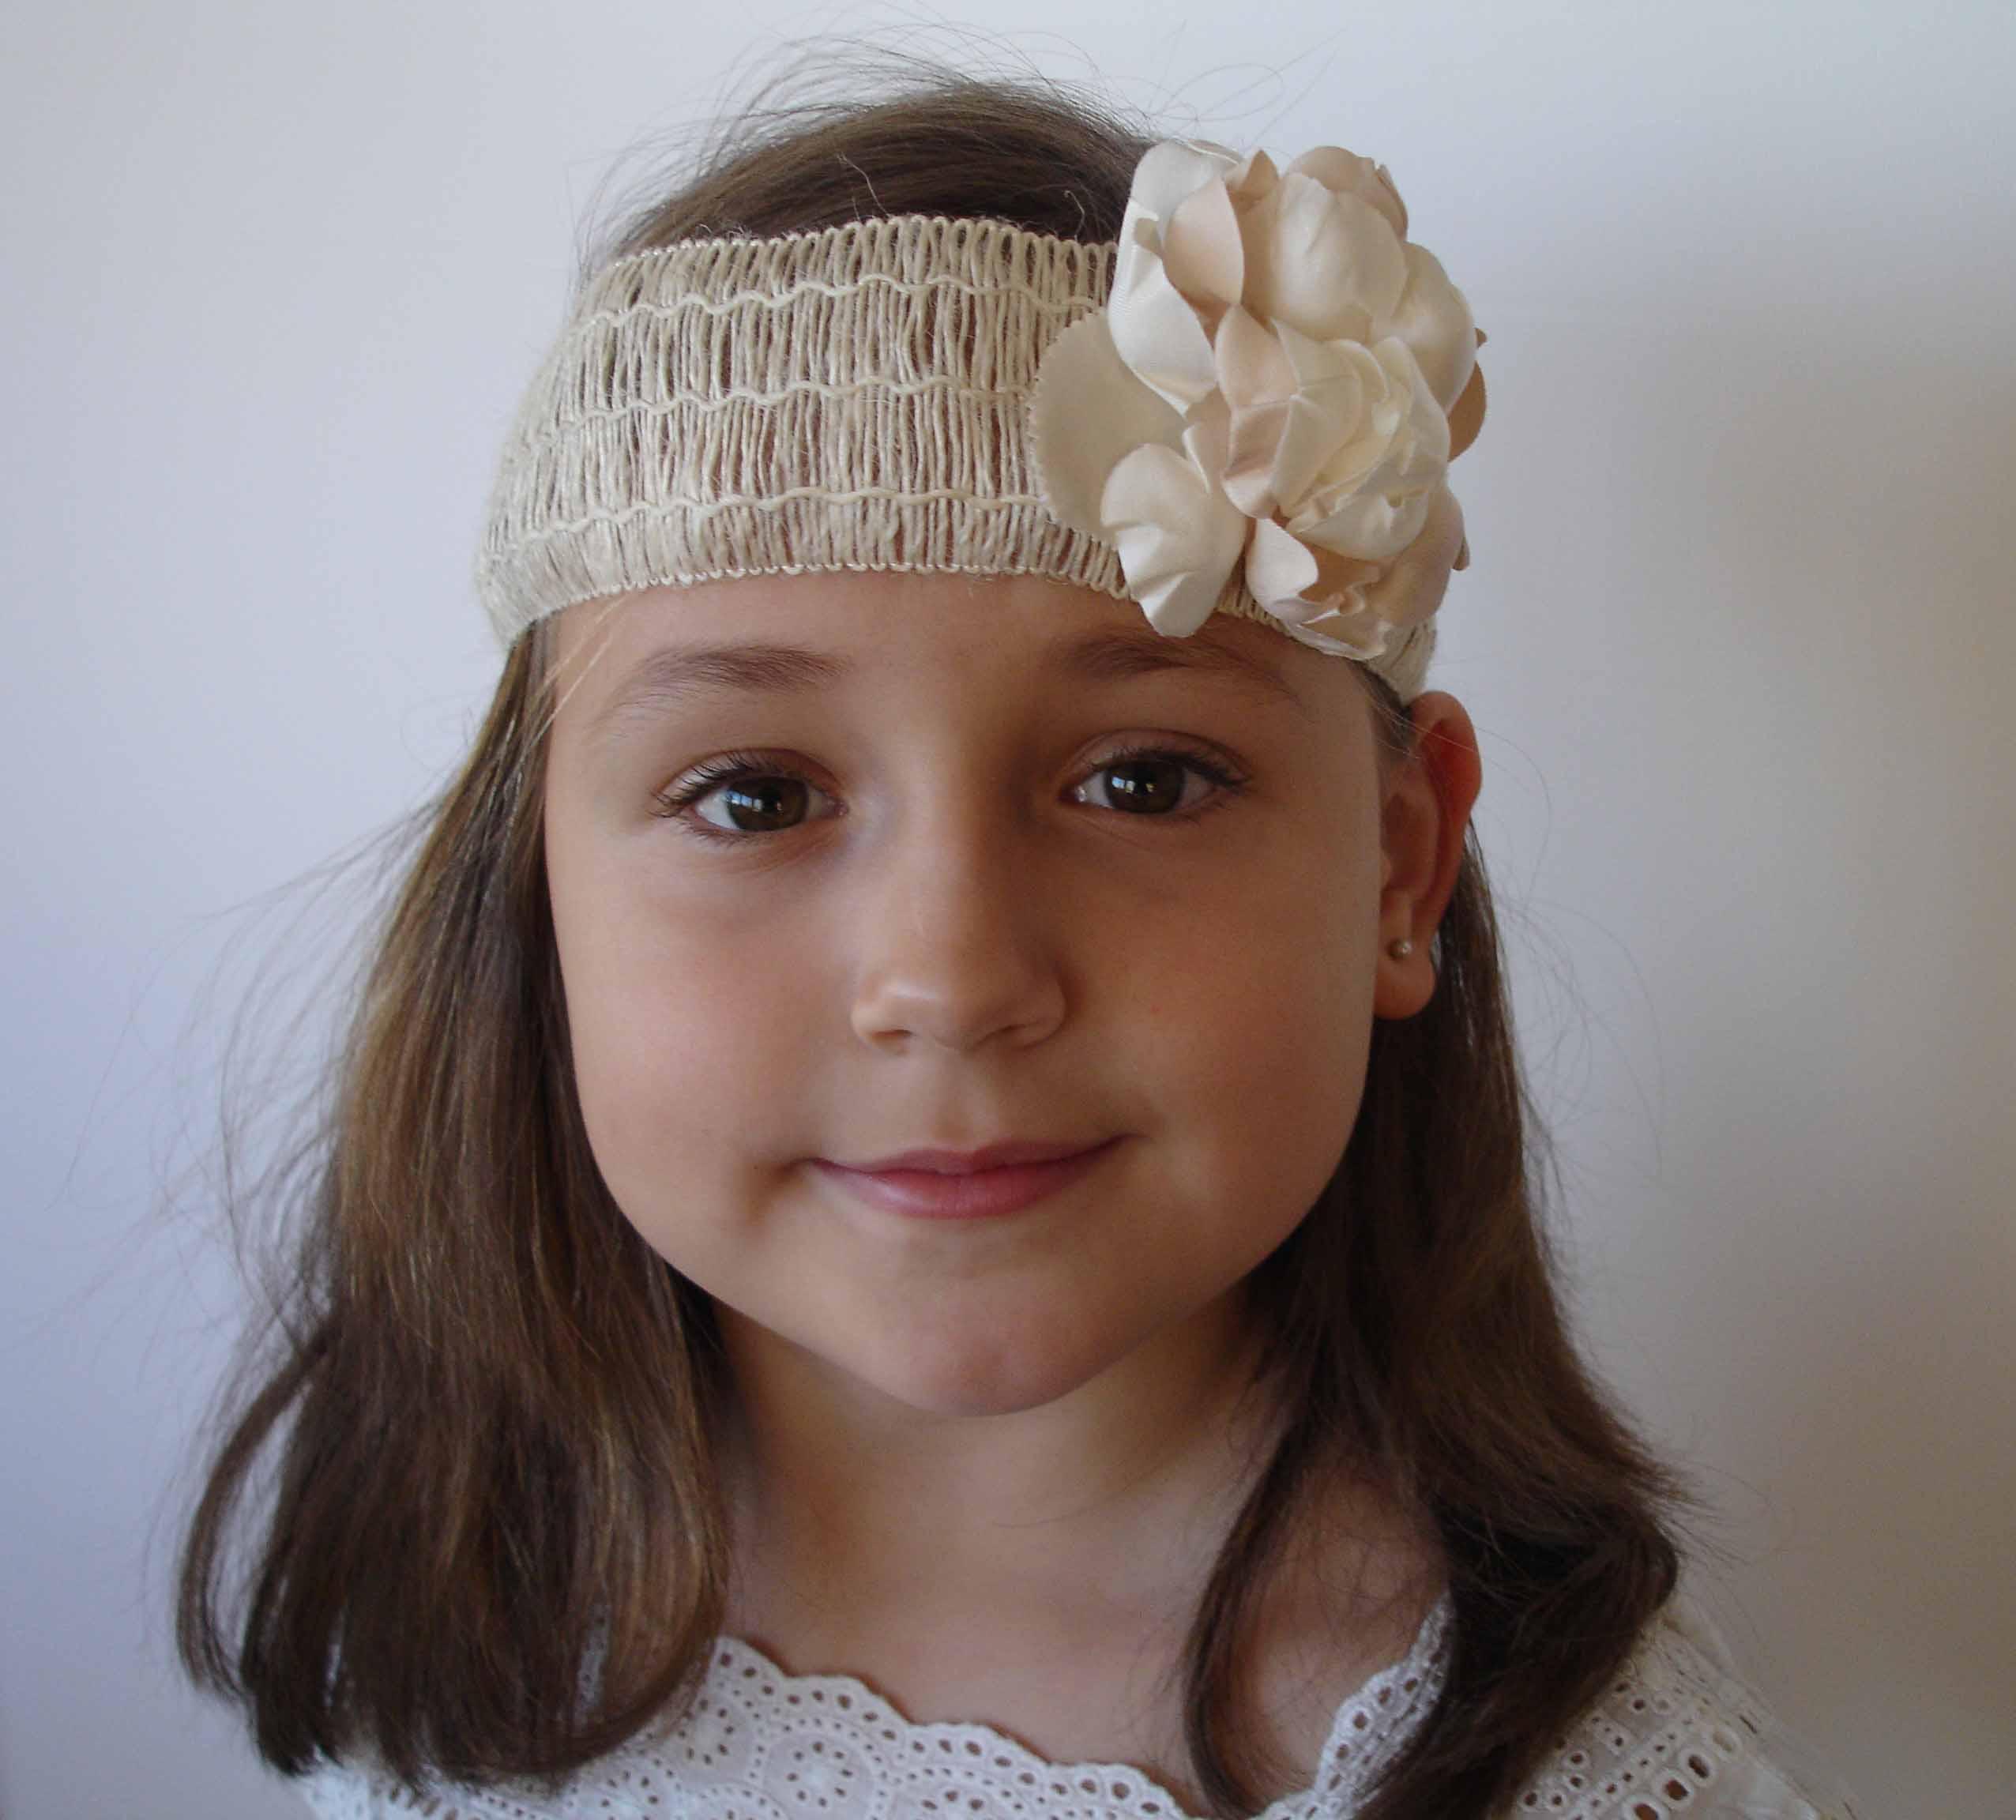 turbante rafia y flor Valeria 6